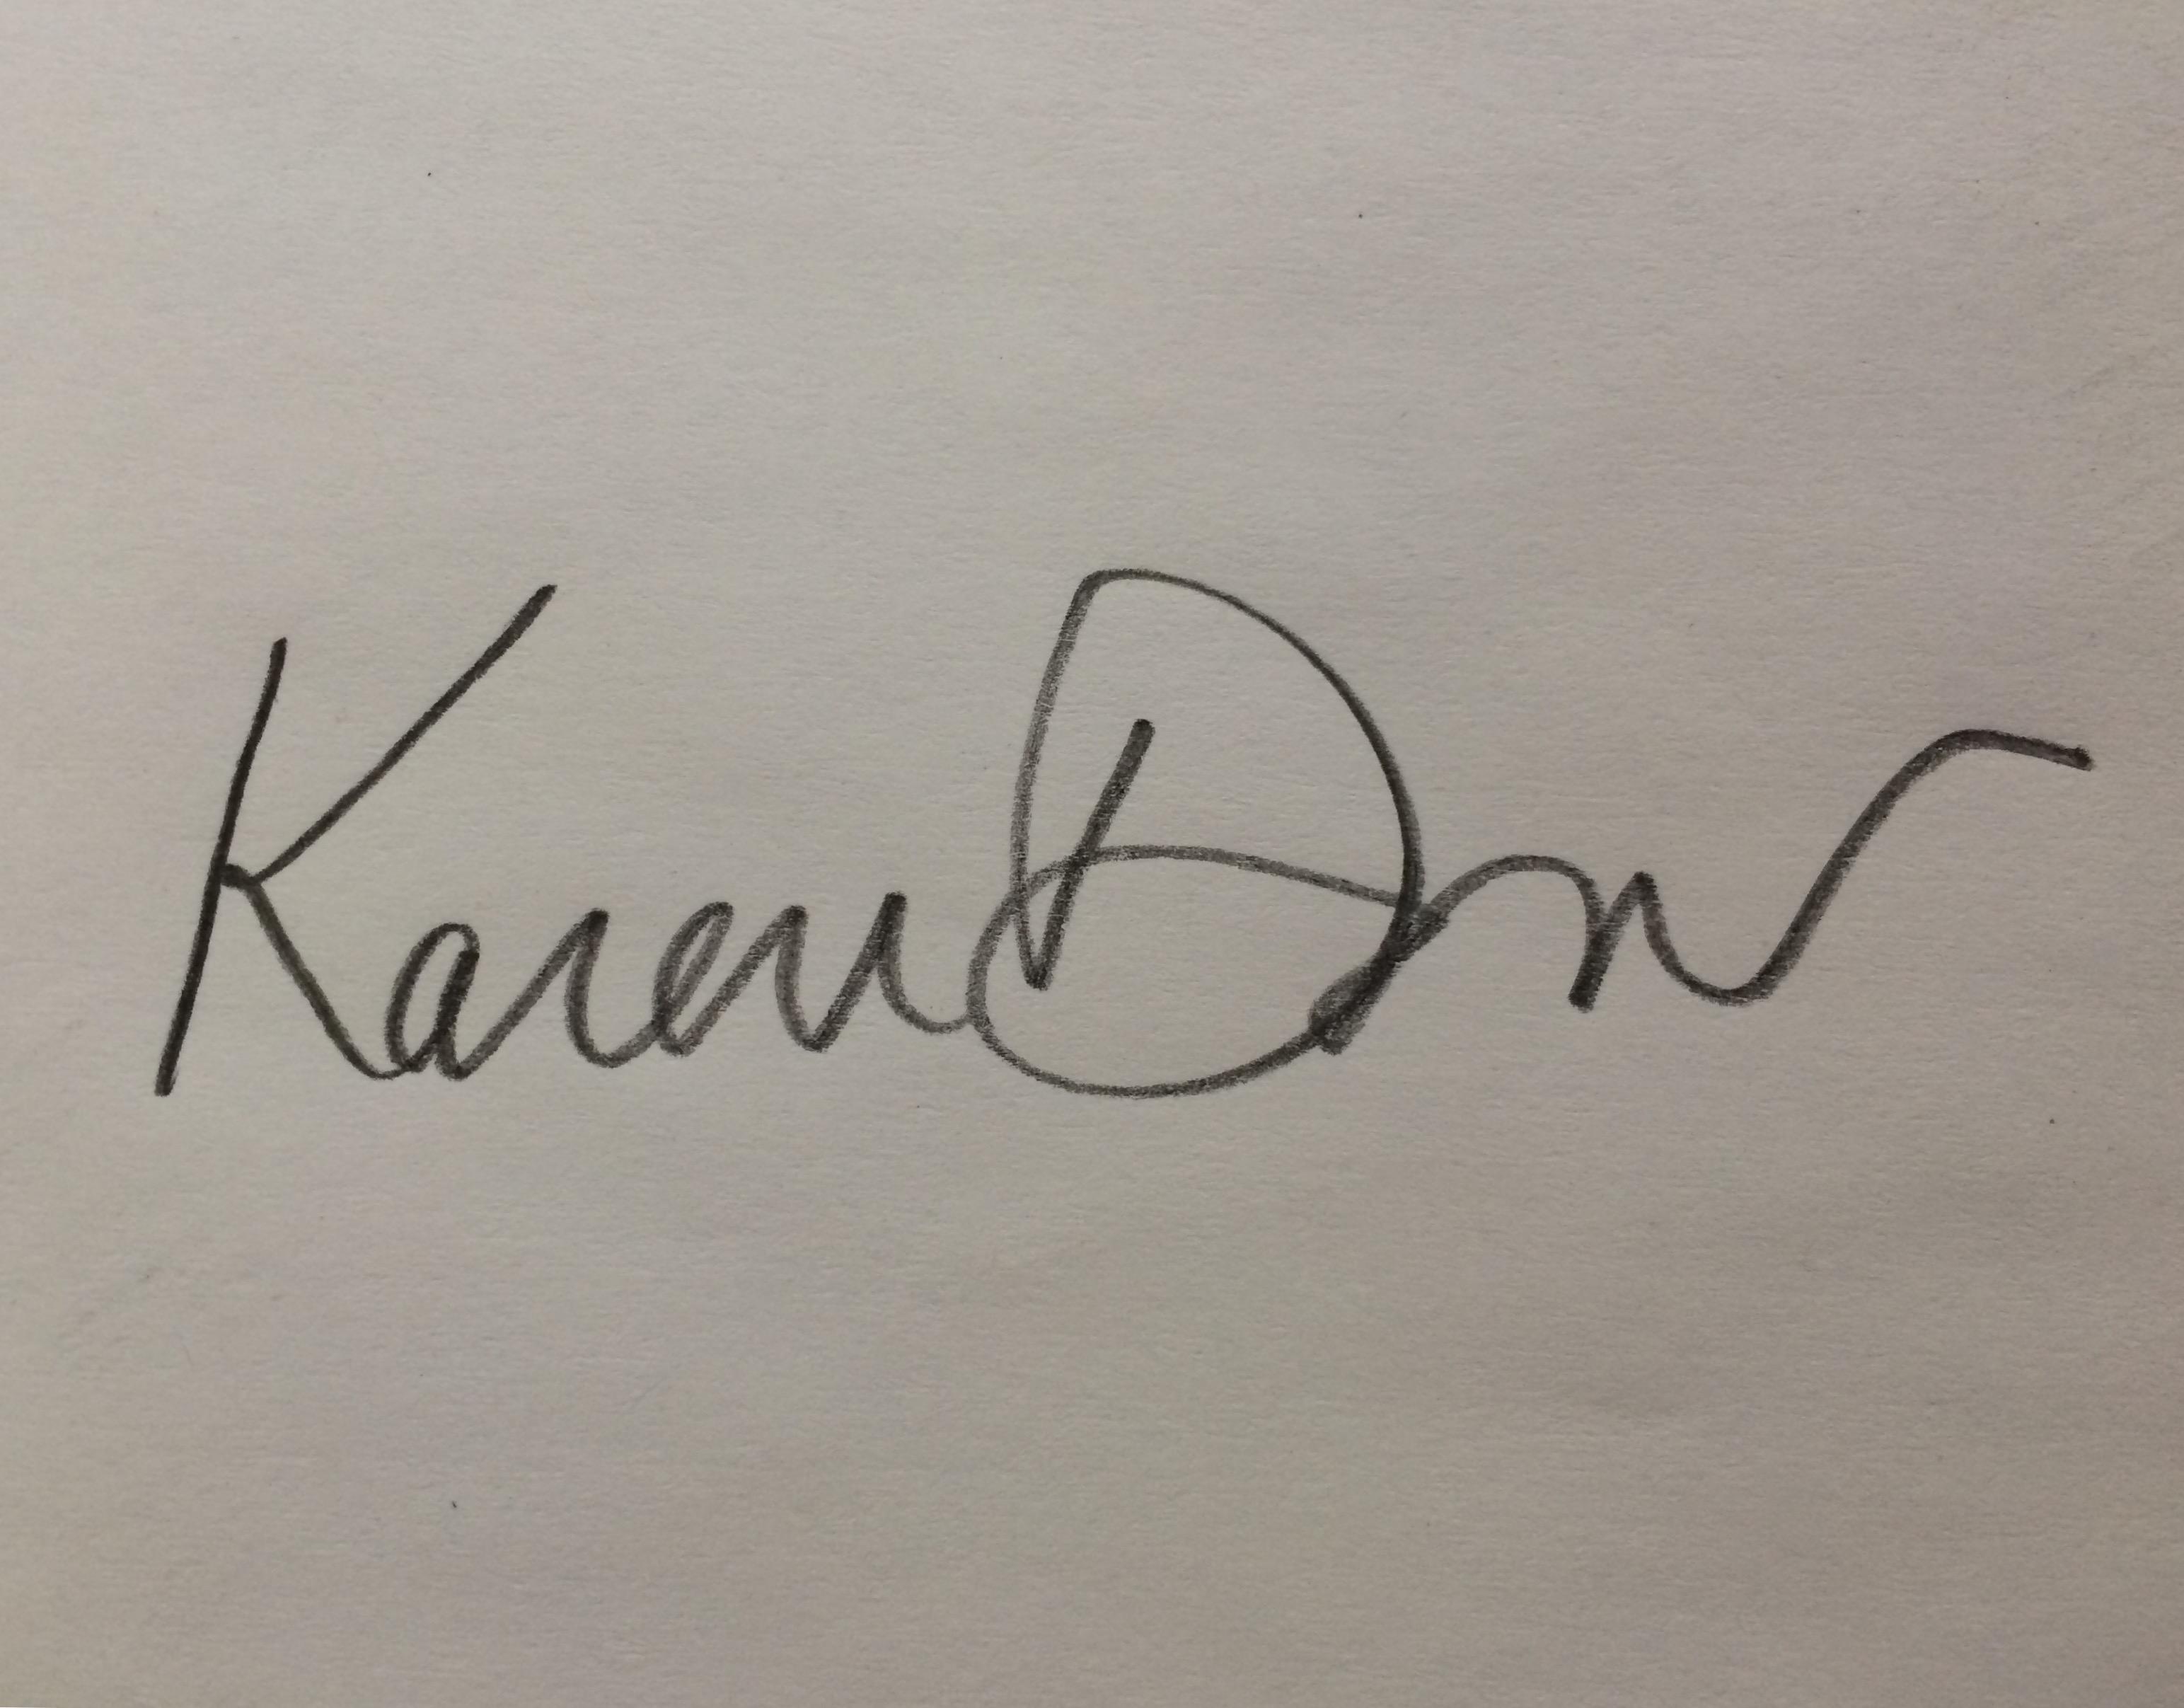 Karen Dow's Signature